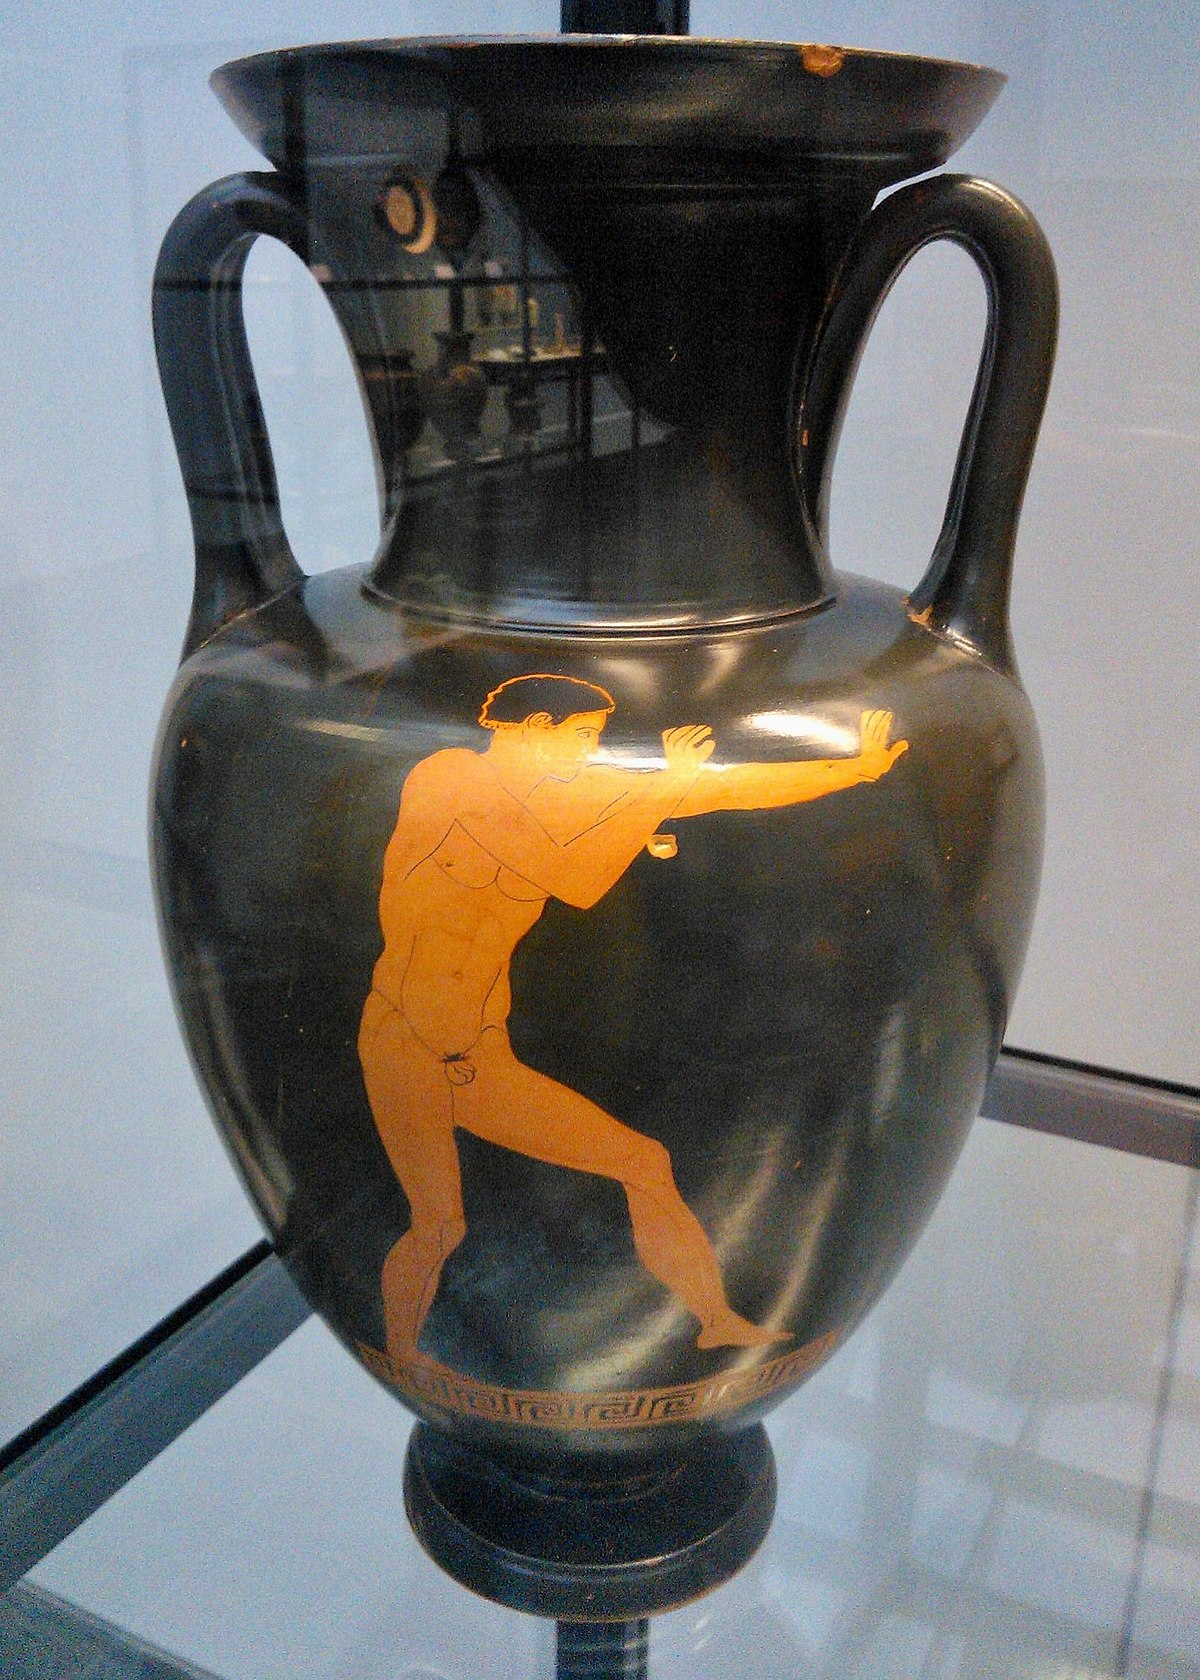 Stance Martial Arts Wikipedia